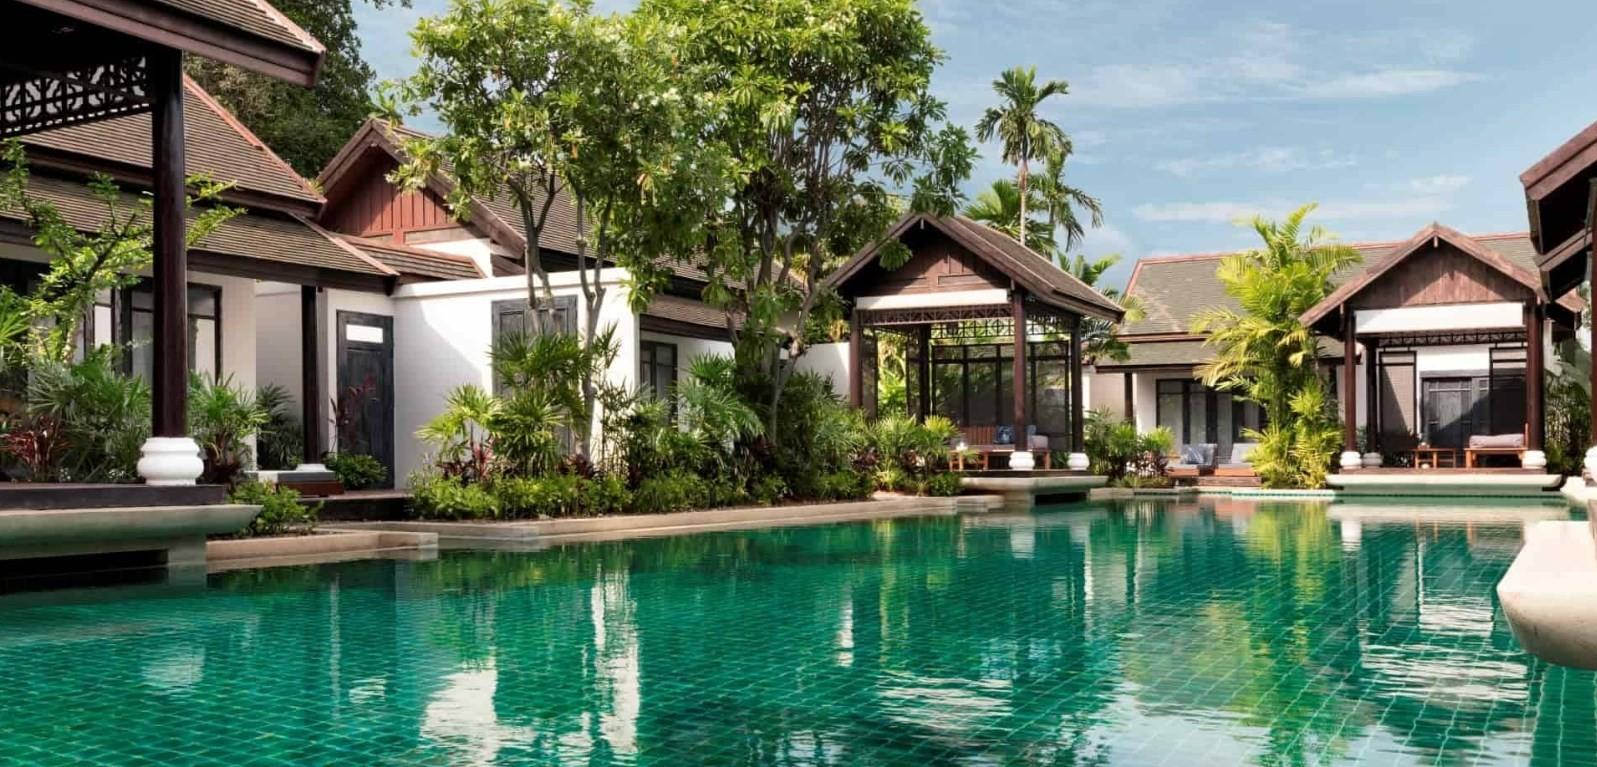 news-main-anantara-lawana-koh-samui-resort-to-reopen-july-1.1593250349.jpg